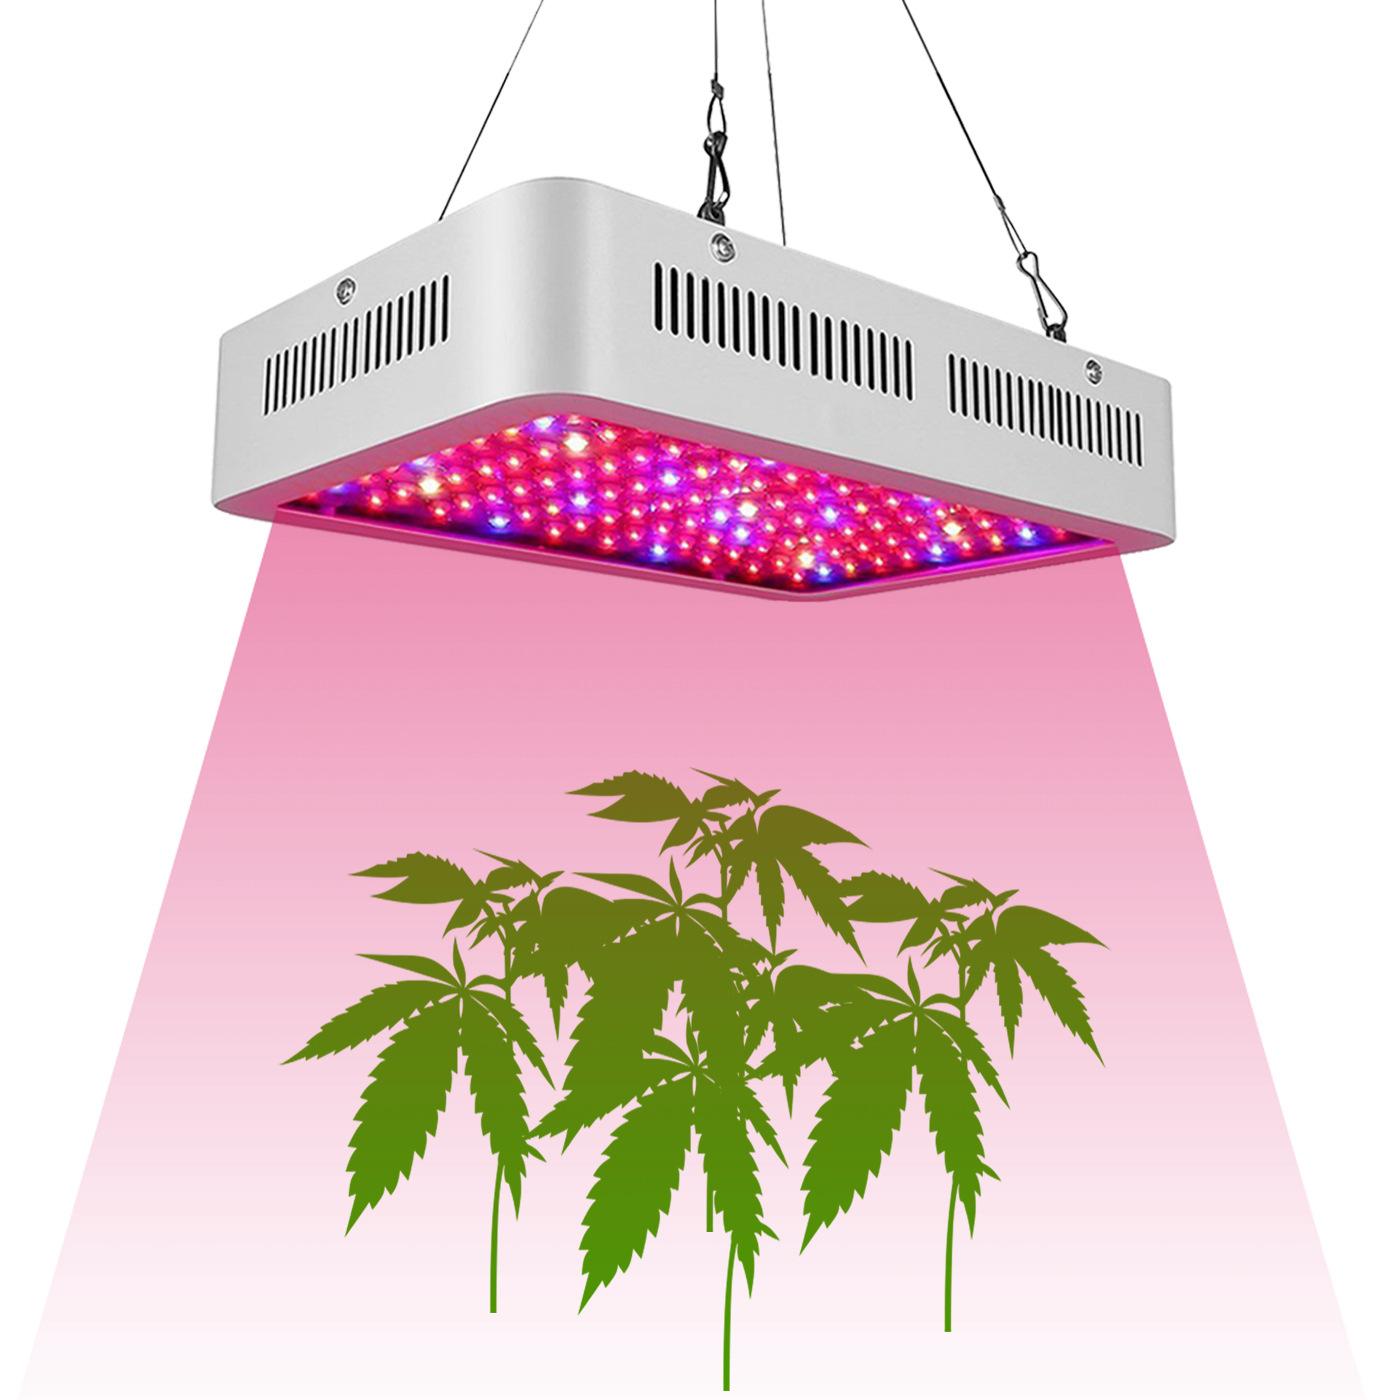 2Pcs 1200W LED Dual Chip Full Spectrum Plant Grow Lamp AC85-265V European regulations